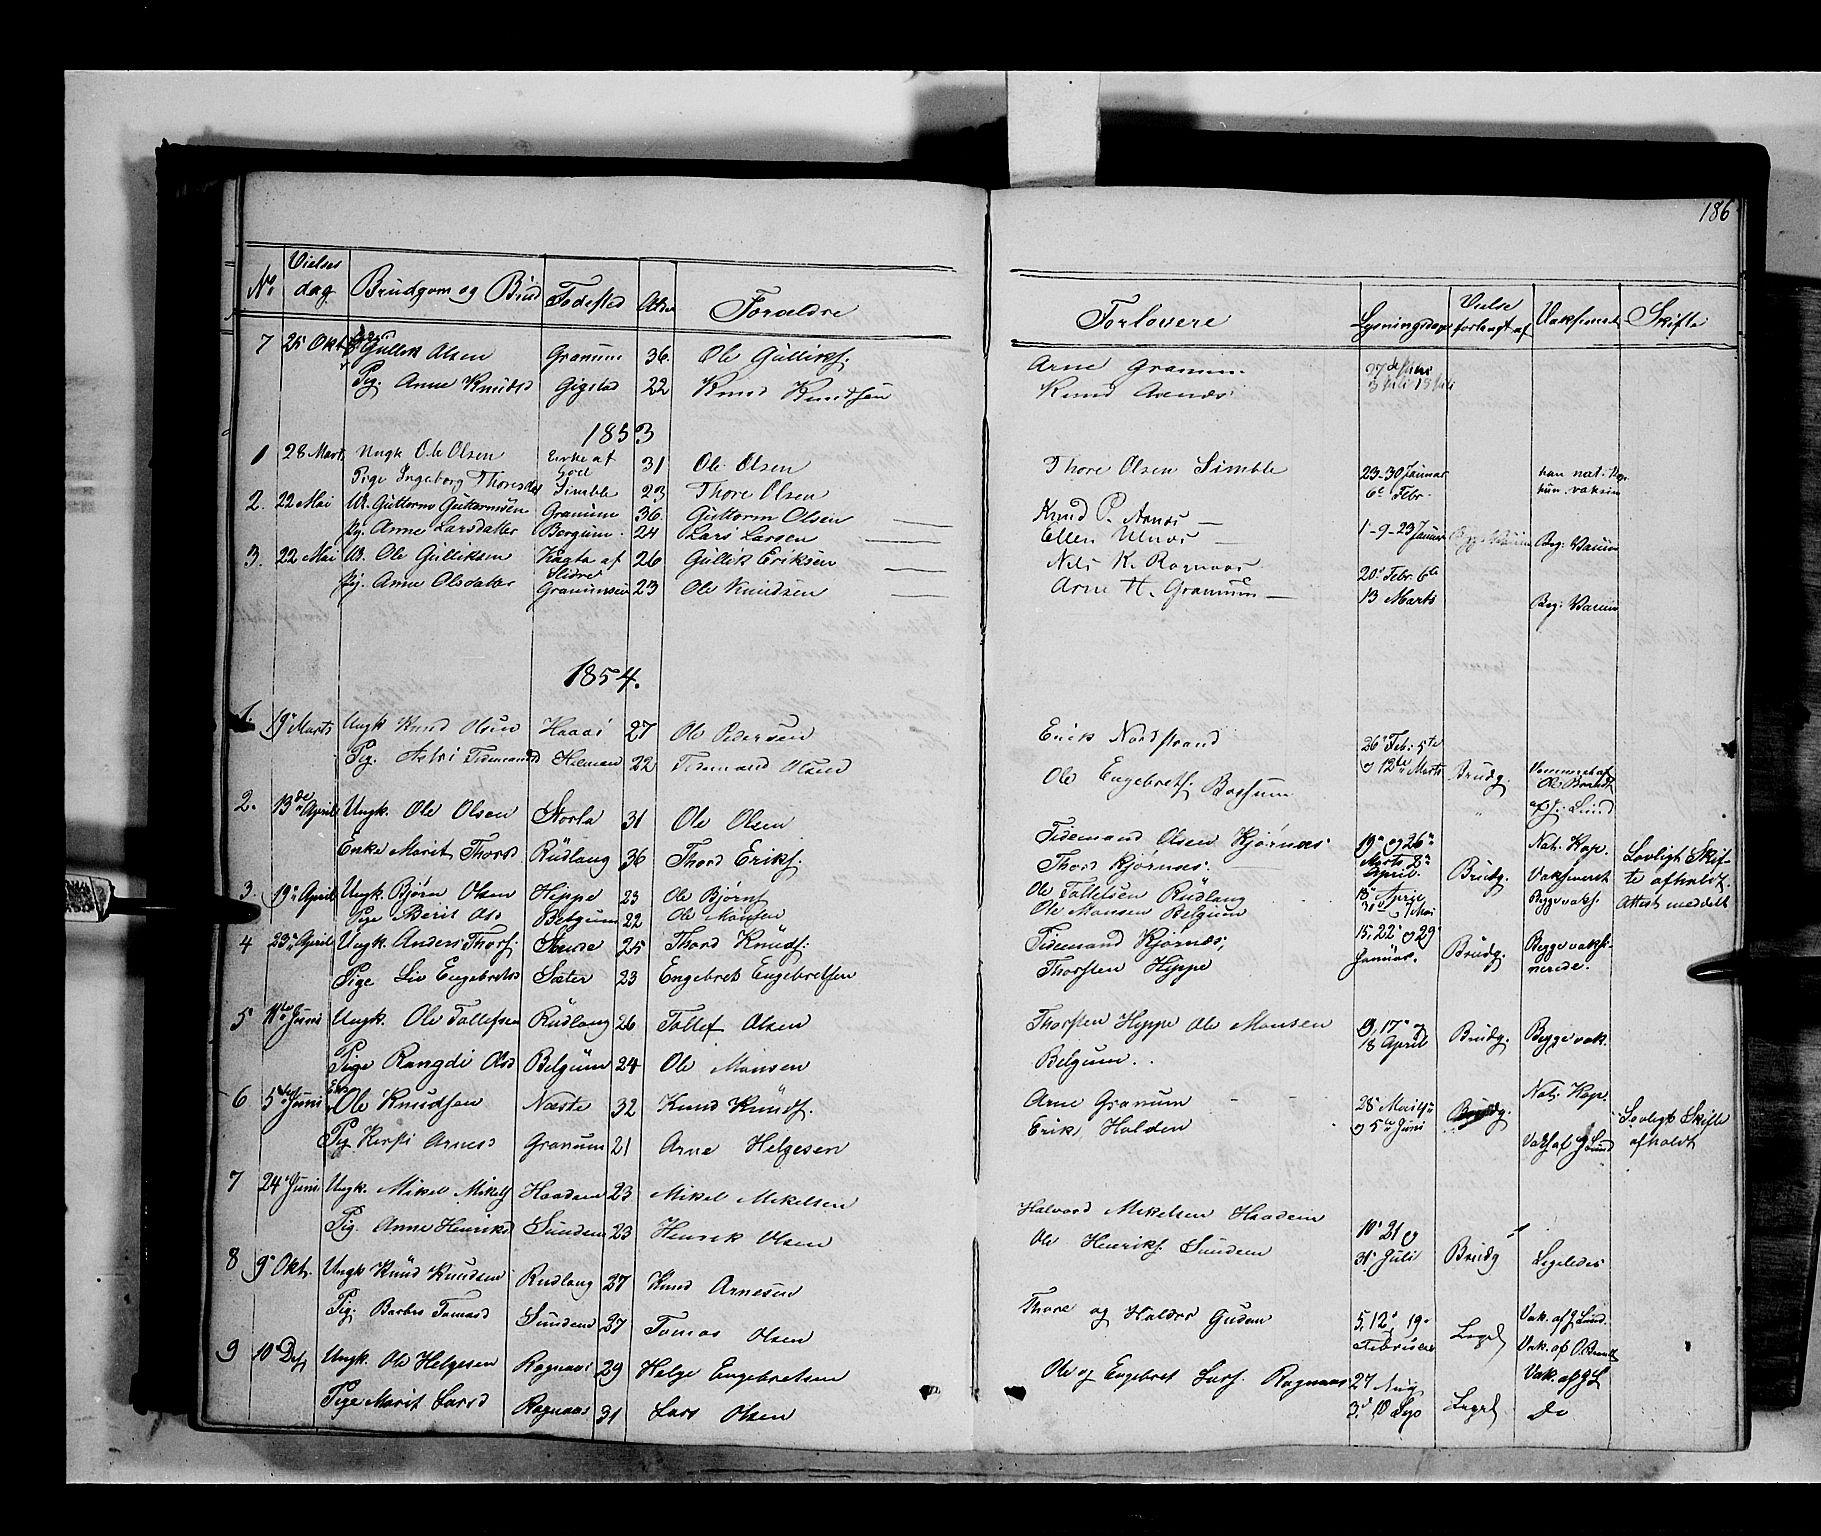 SAH, Nord-Aurdal prestekontor, Ministerialbok nr. 6, 1842-1863, s. 186